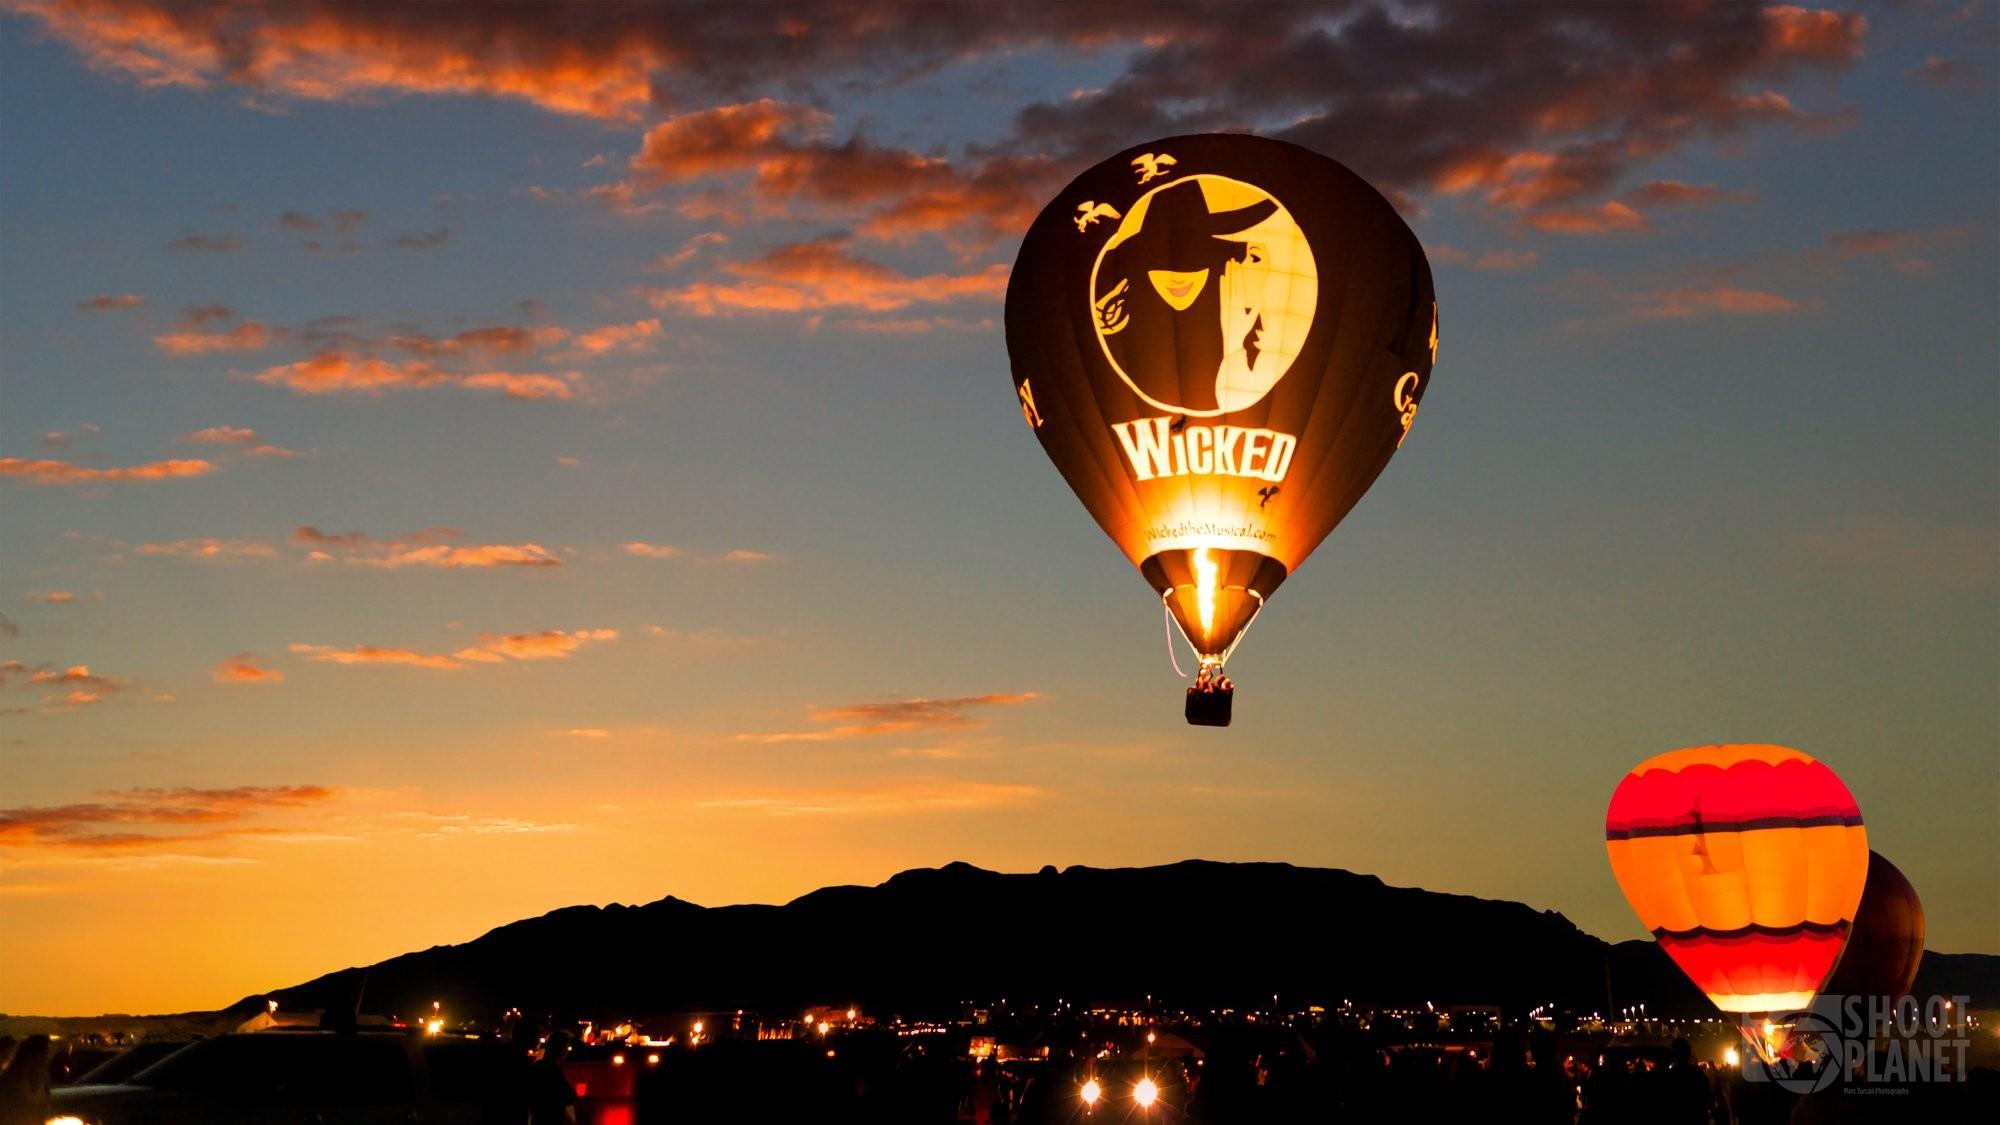 Sunrise on hot air balloons, Albuquerque USA